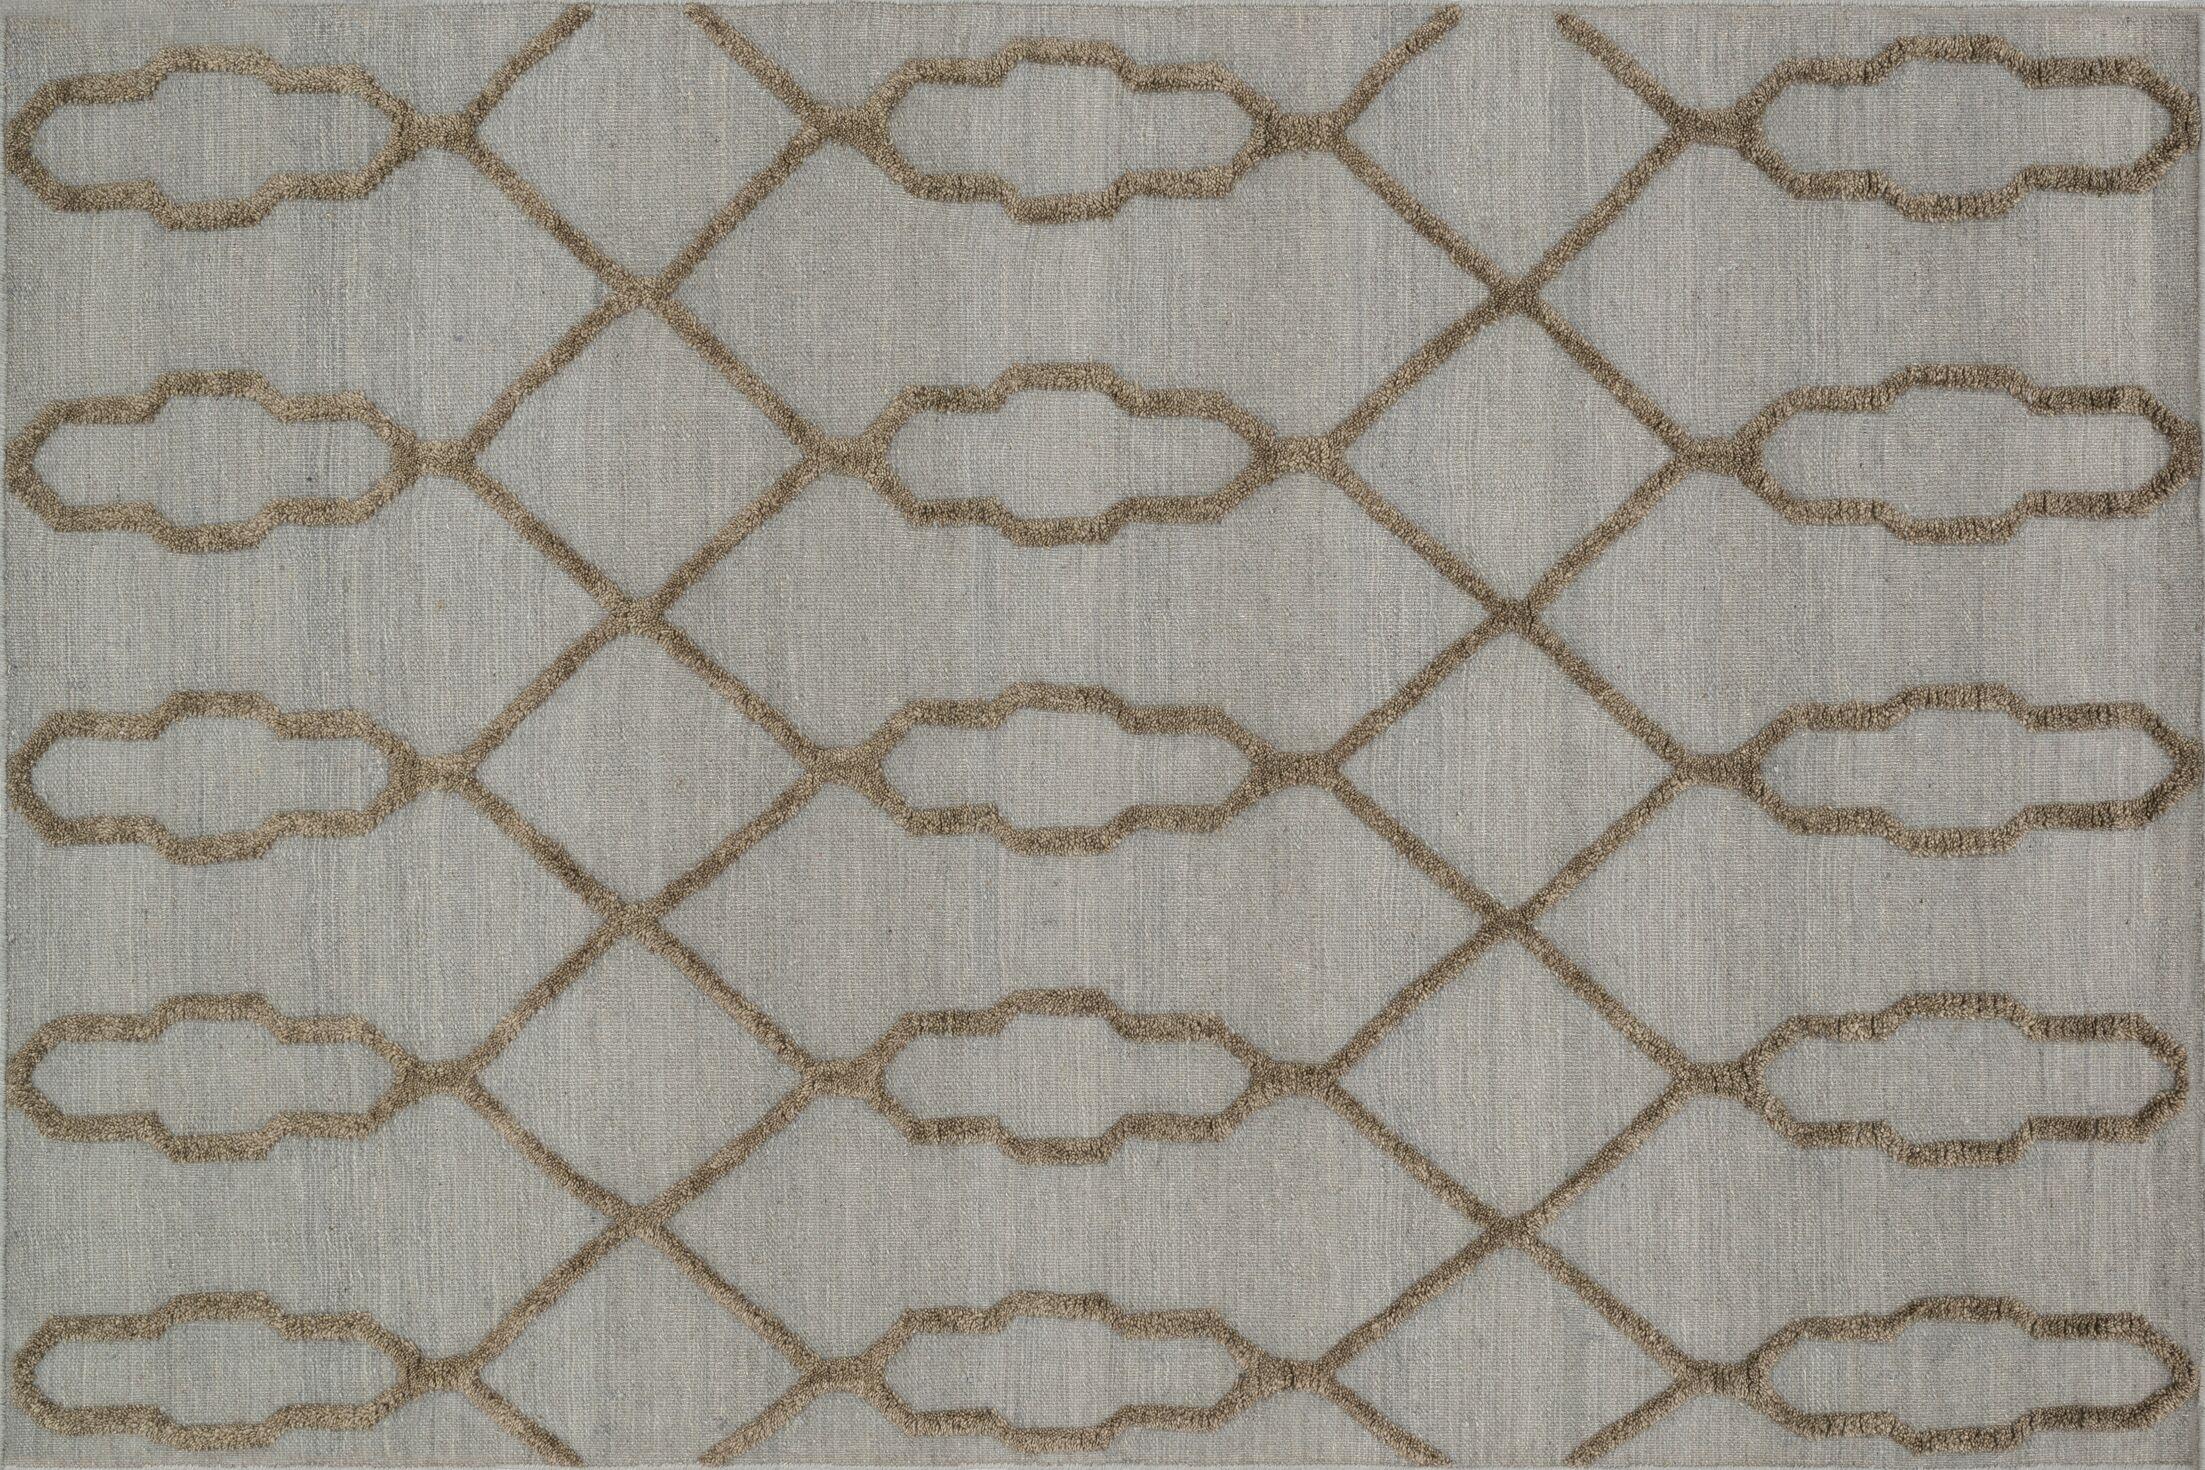 Mazur Hand-Woven Slate Area Rug Rug Size: Rectangle 3'6